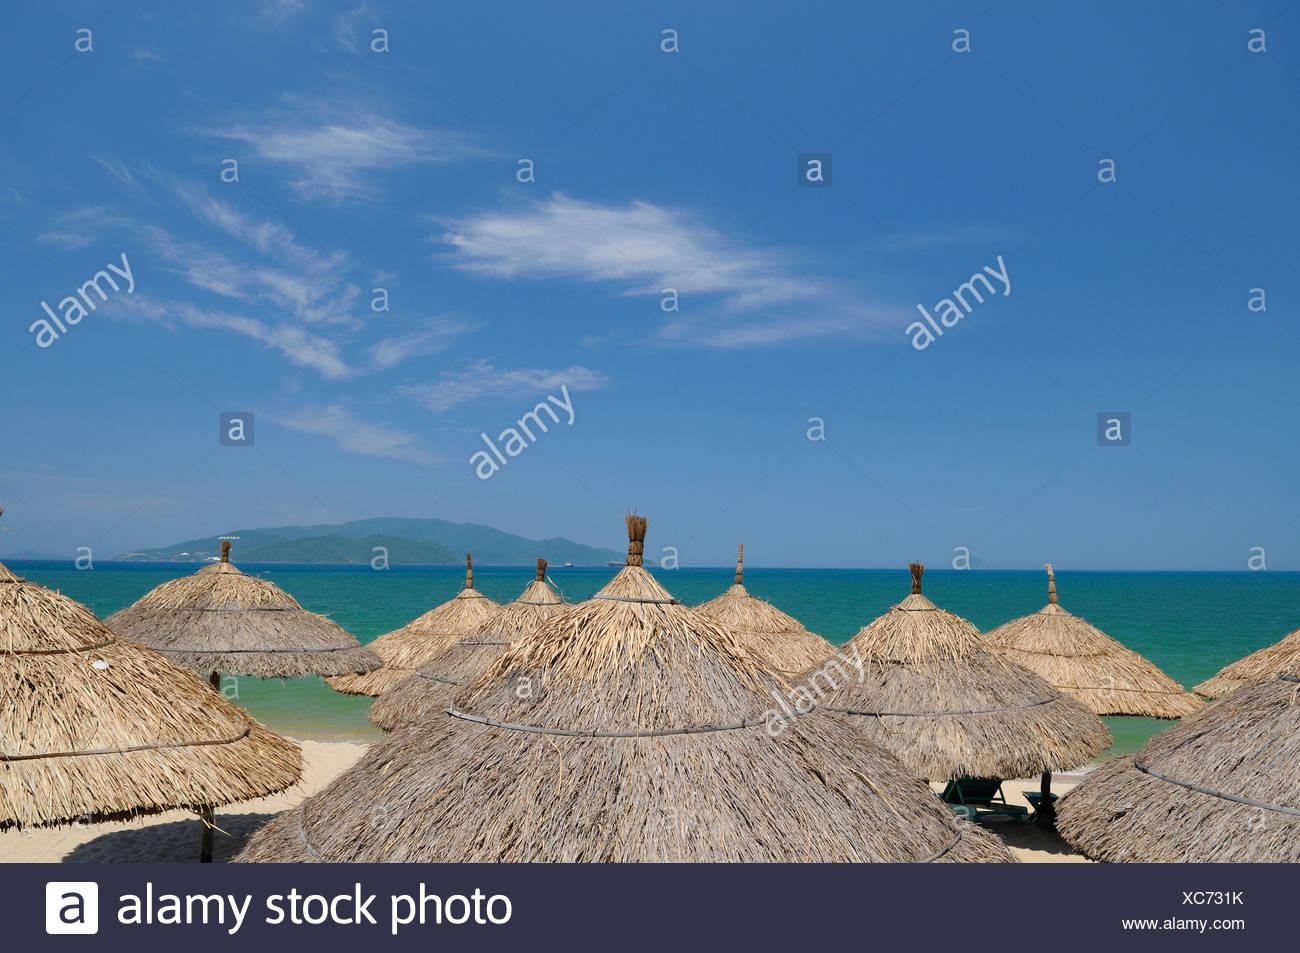 Umbrellas, beach of Nha Trang, Vietnam, Southeast Asia - Stock Image